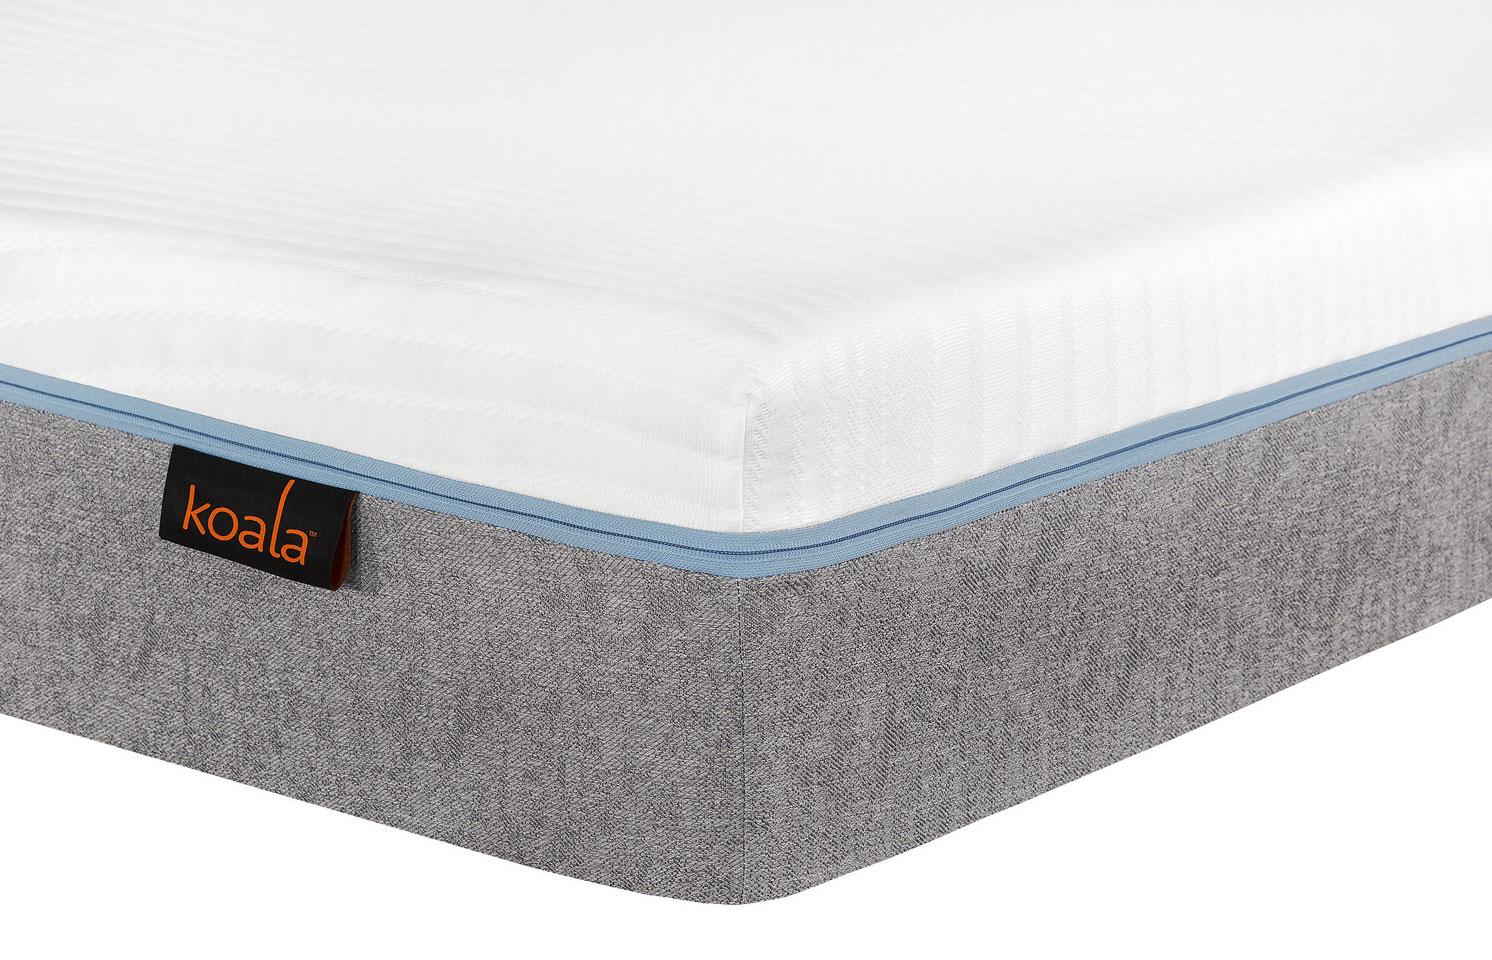 koala mattress review - koala mattress corner